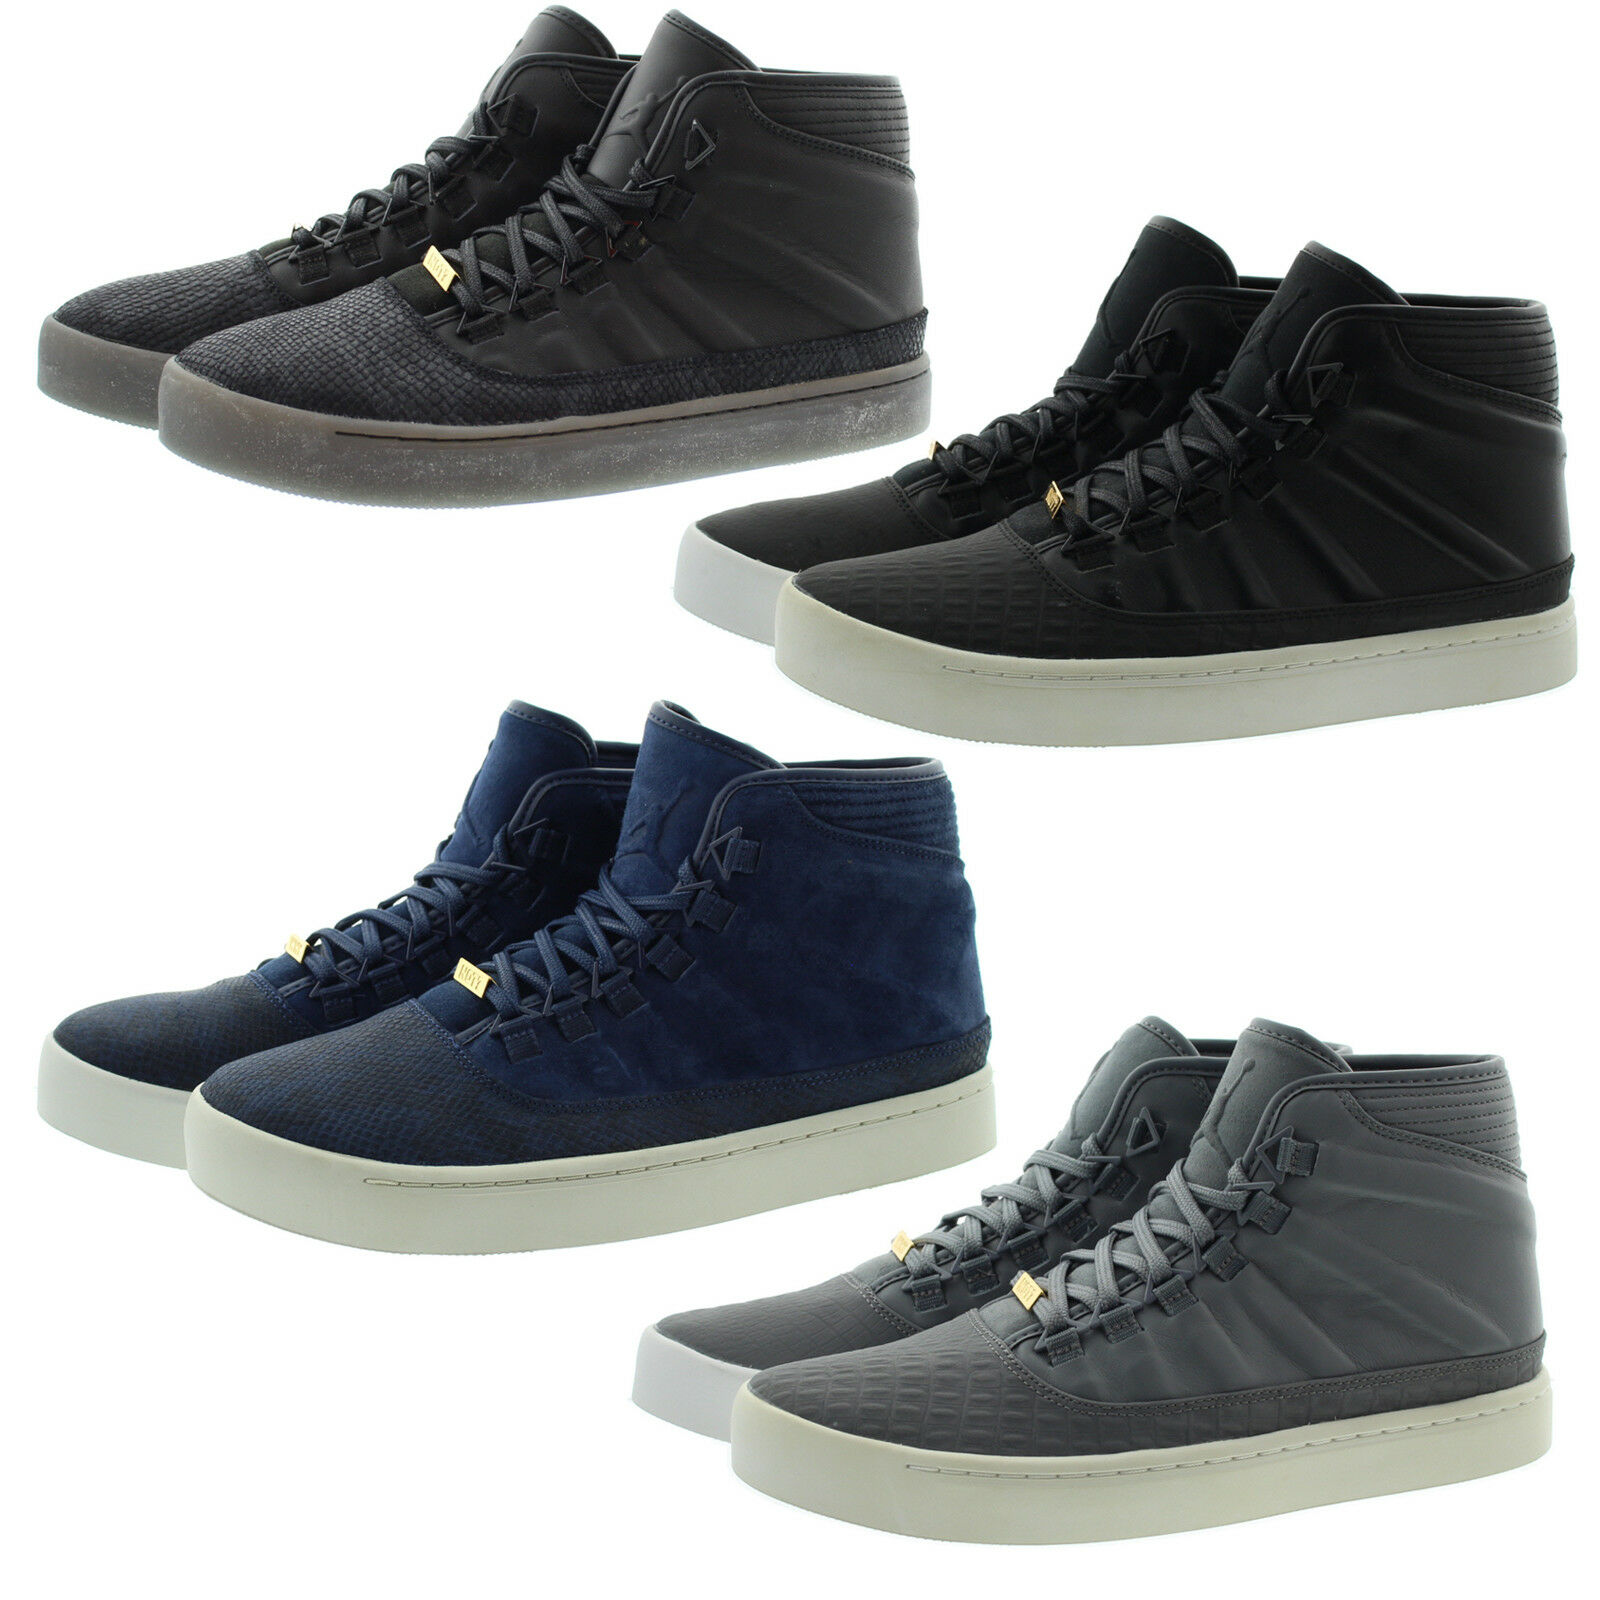 728681990af9 Nike 768934 Mens Westbrook Shoes 0 Mid Top Basketball Athletic Shoes  Westbrook Sneakers 664ffb